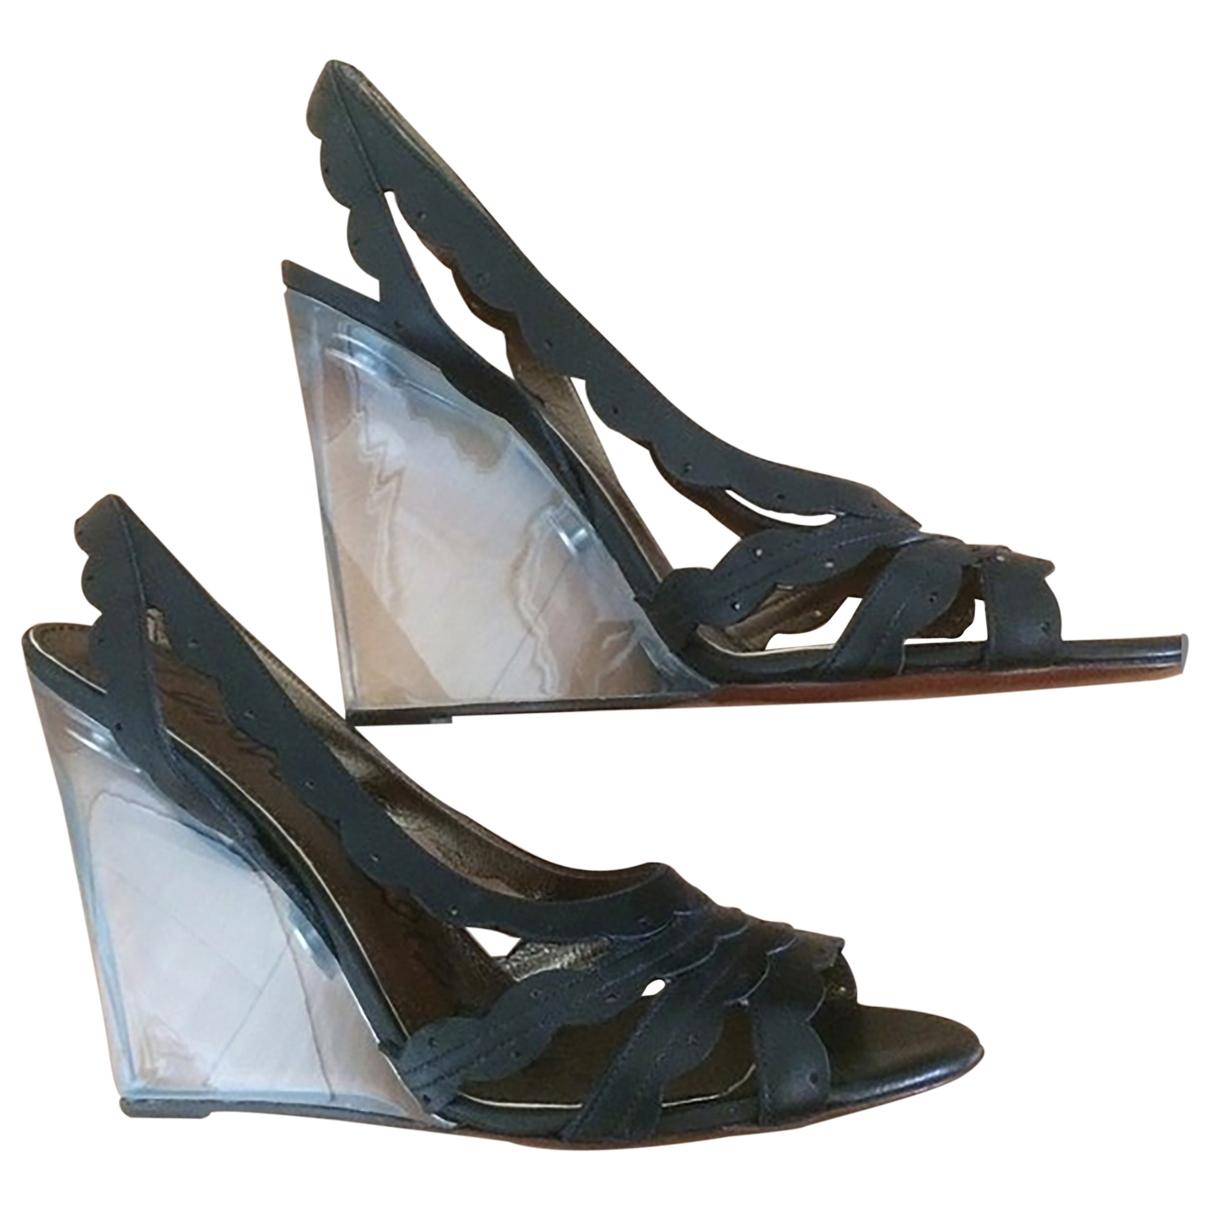 Lanvin \N Black Leather Sandals for Women 39.5 EU